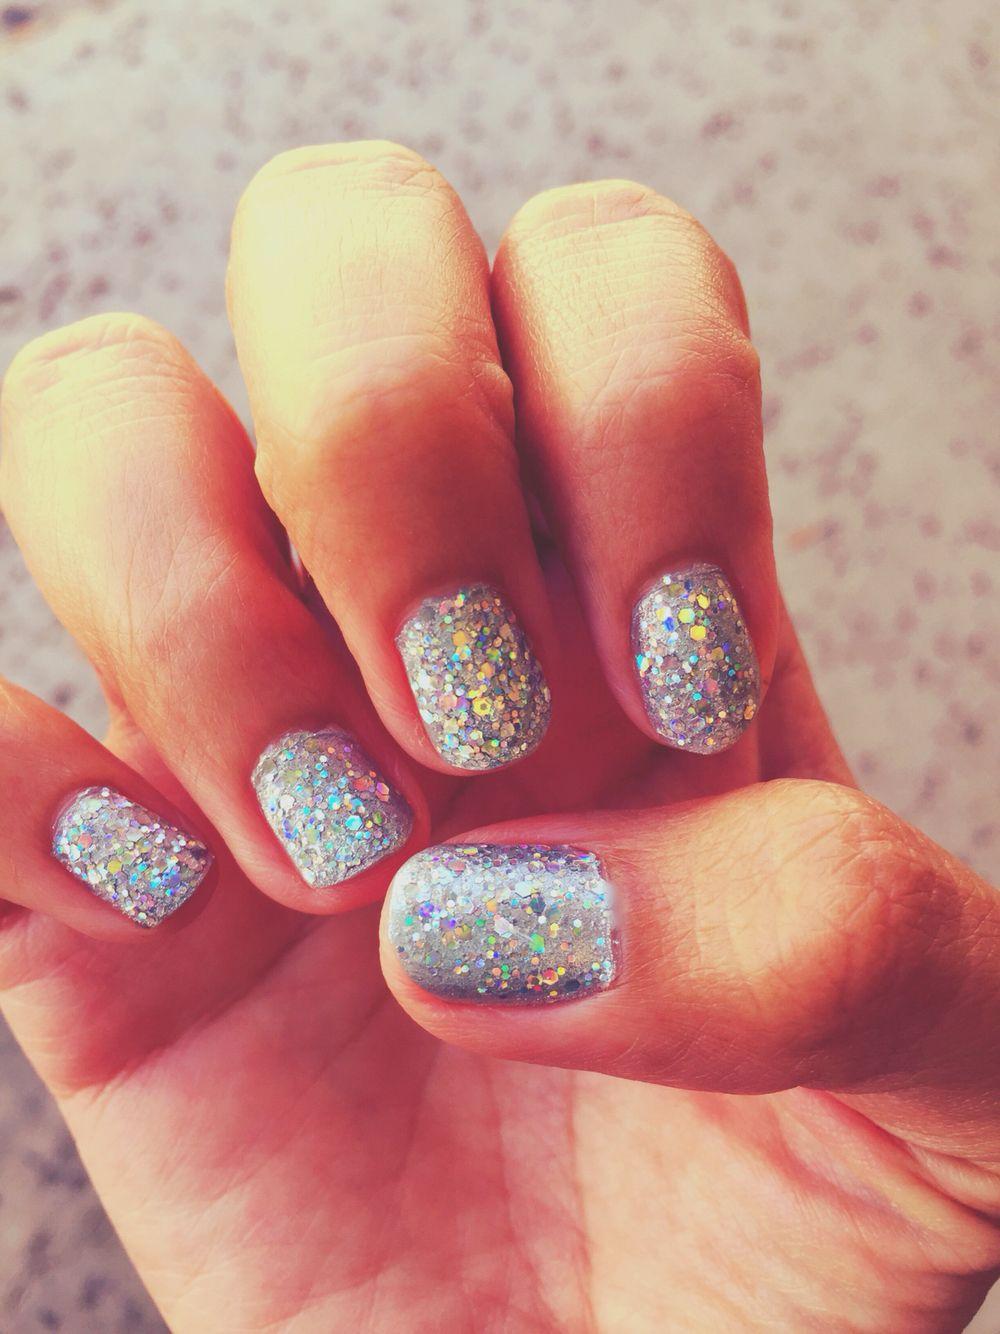 Silver glitter nails! Summer nails